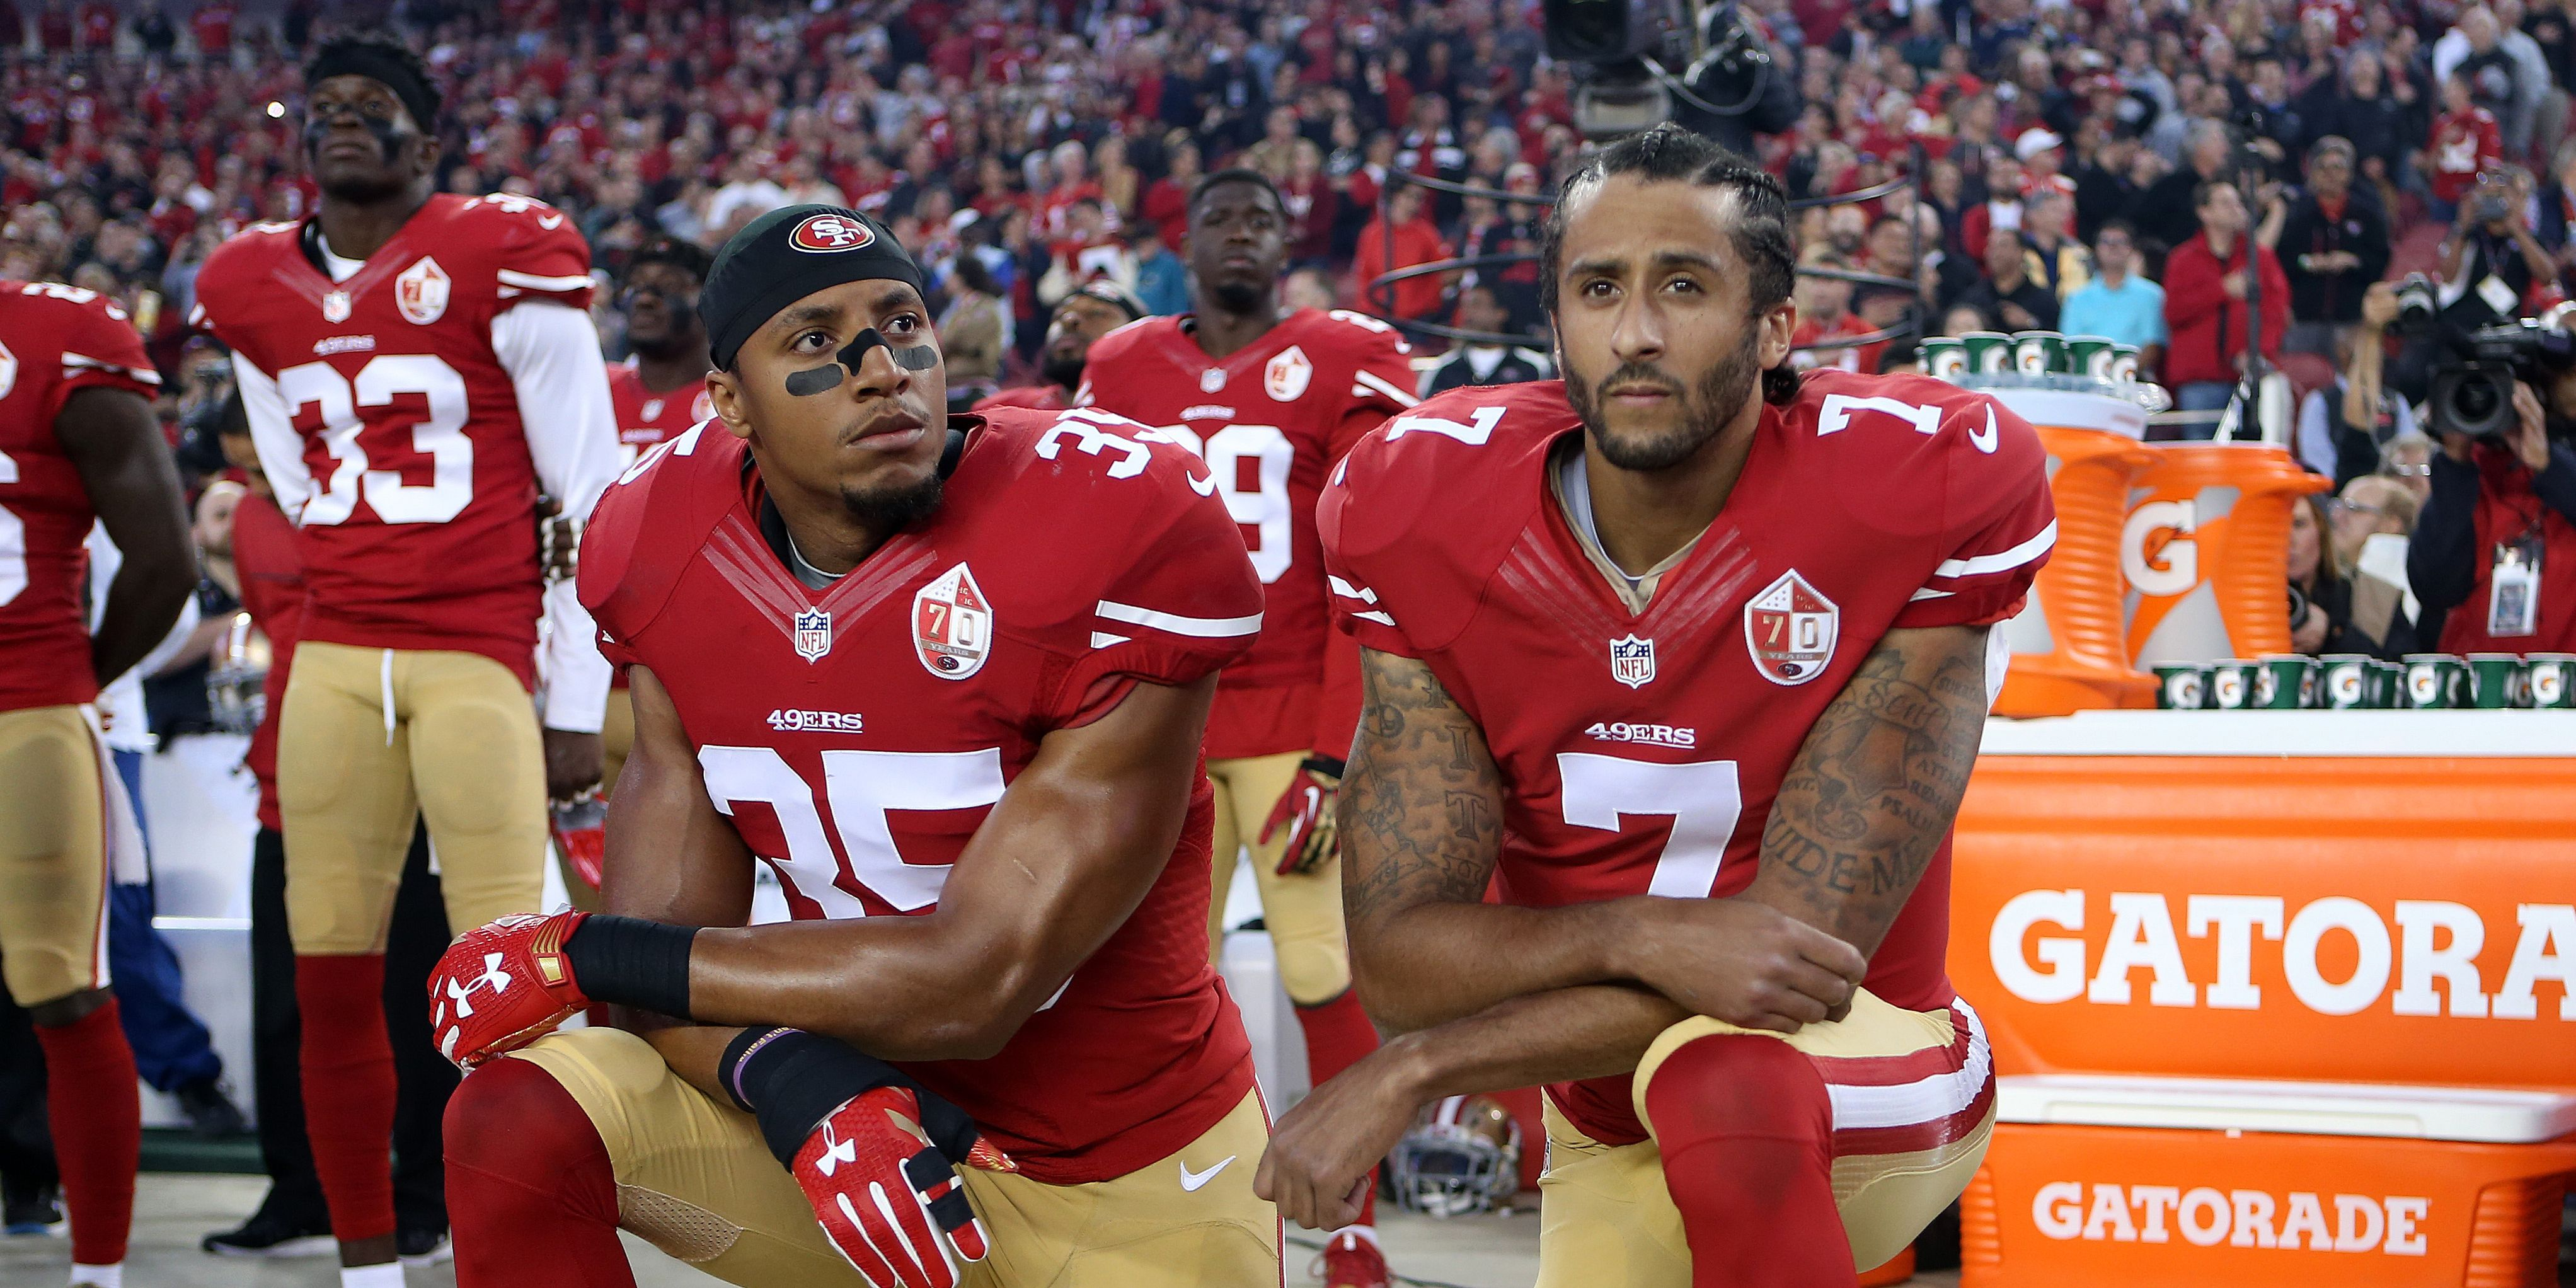 NFL, Colin Kaepernick settle collusion lawsuit